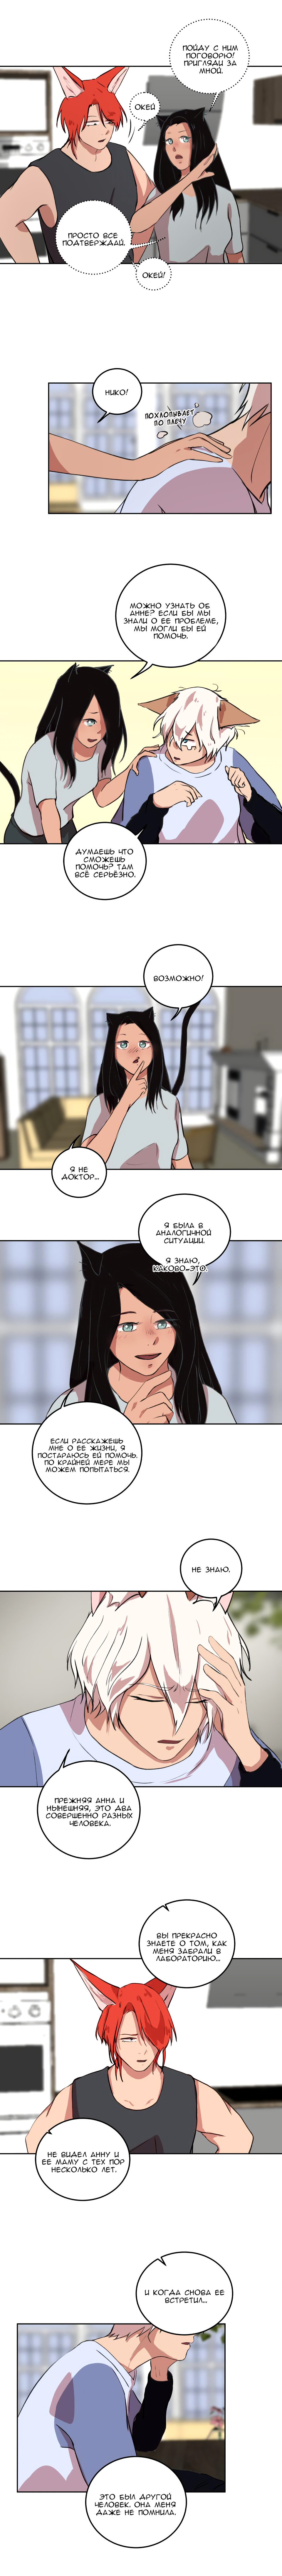 https://r1.ninemanga.com/comics/pic2/58/31802/416853/153371692227.jpg Page 4